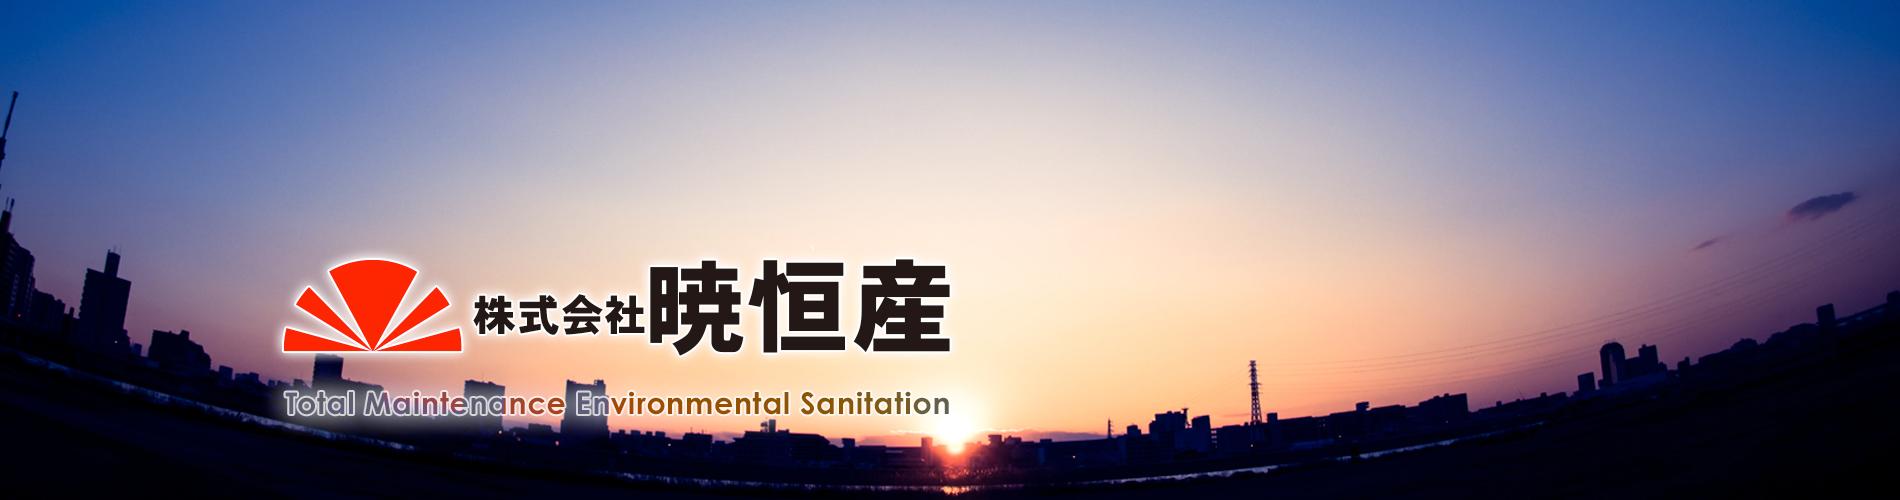 株式会社 暁恒産